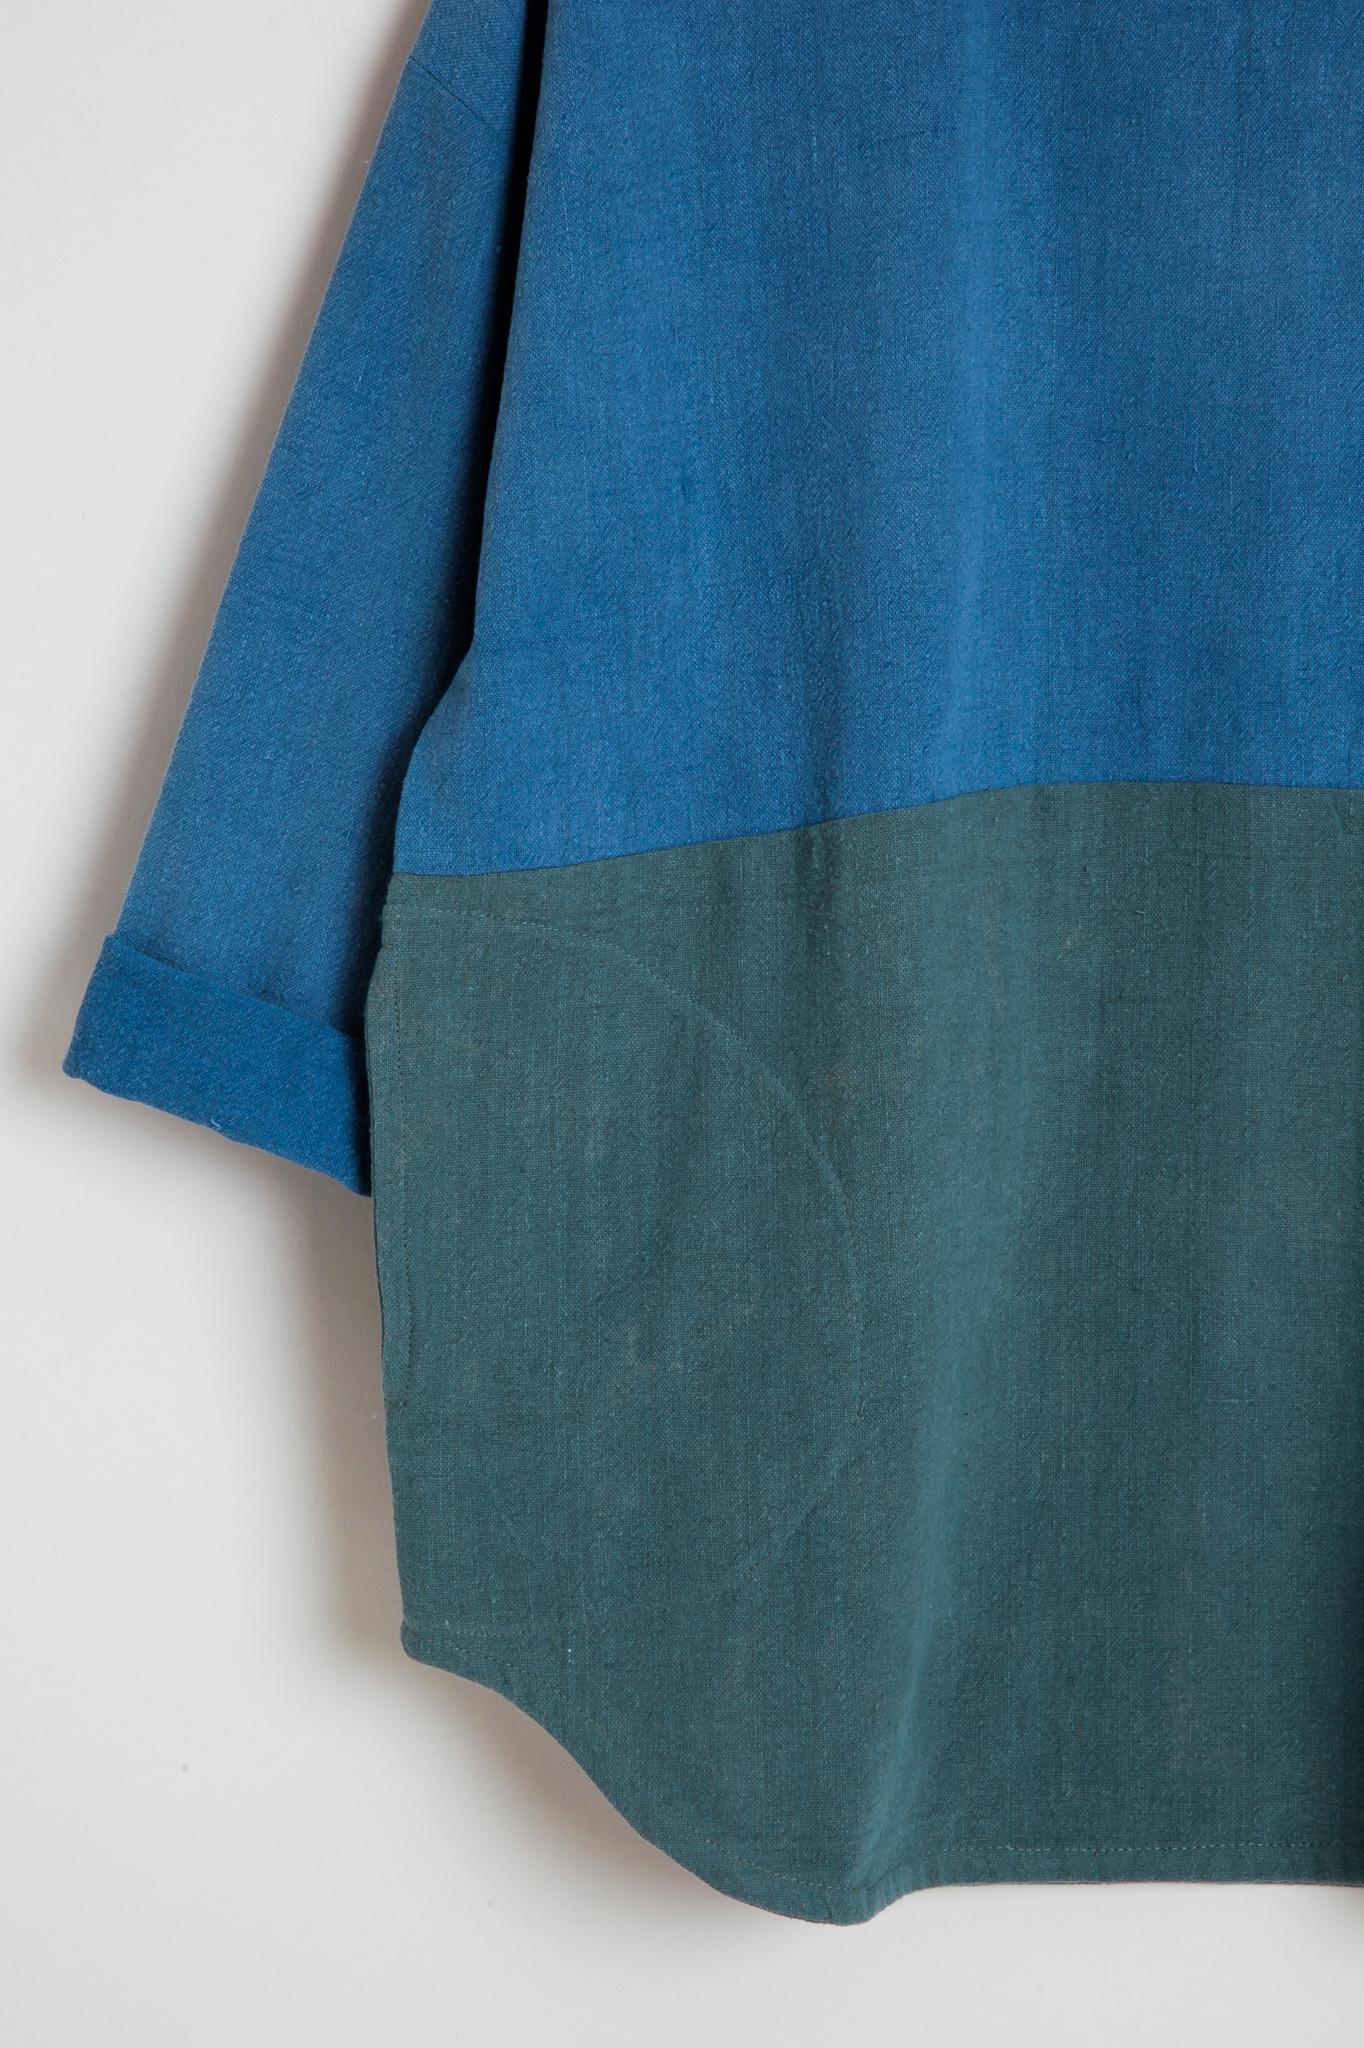 Colorblock Textured Cotton Top